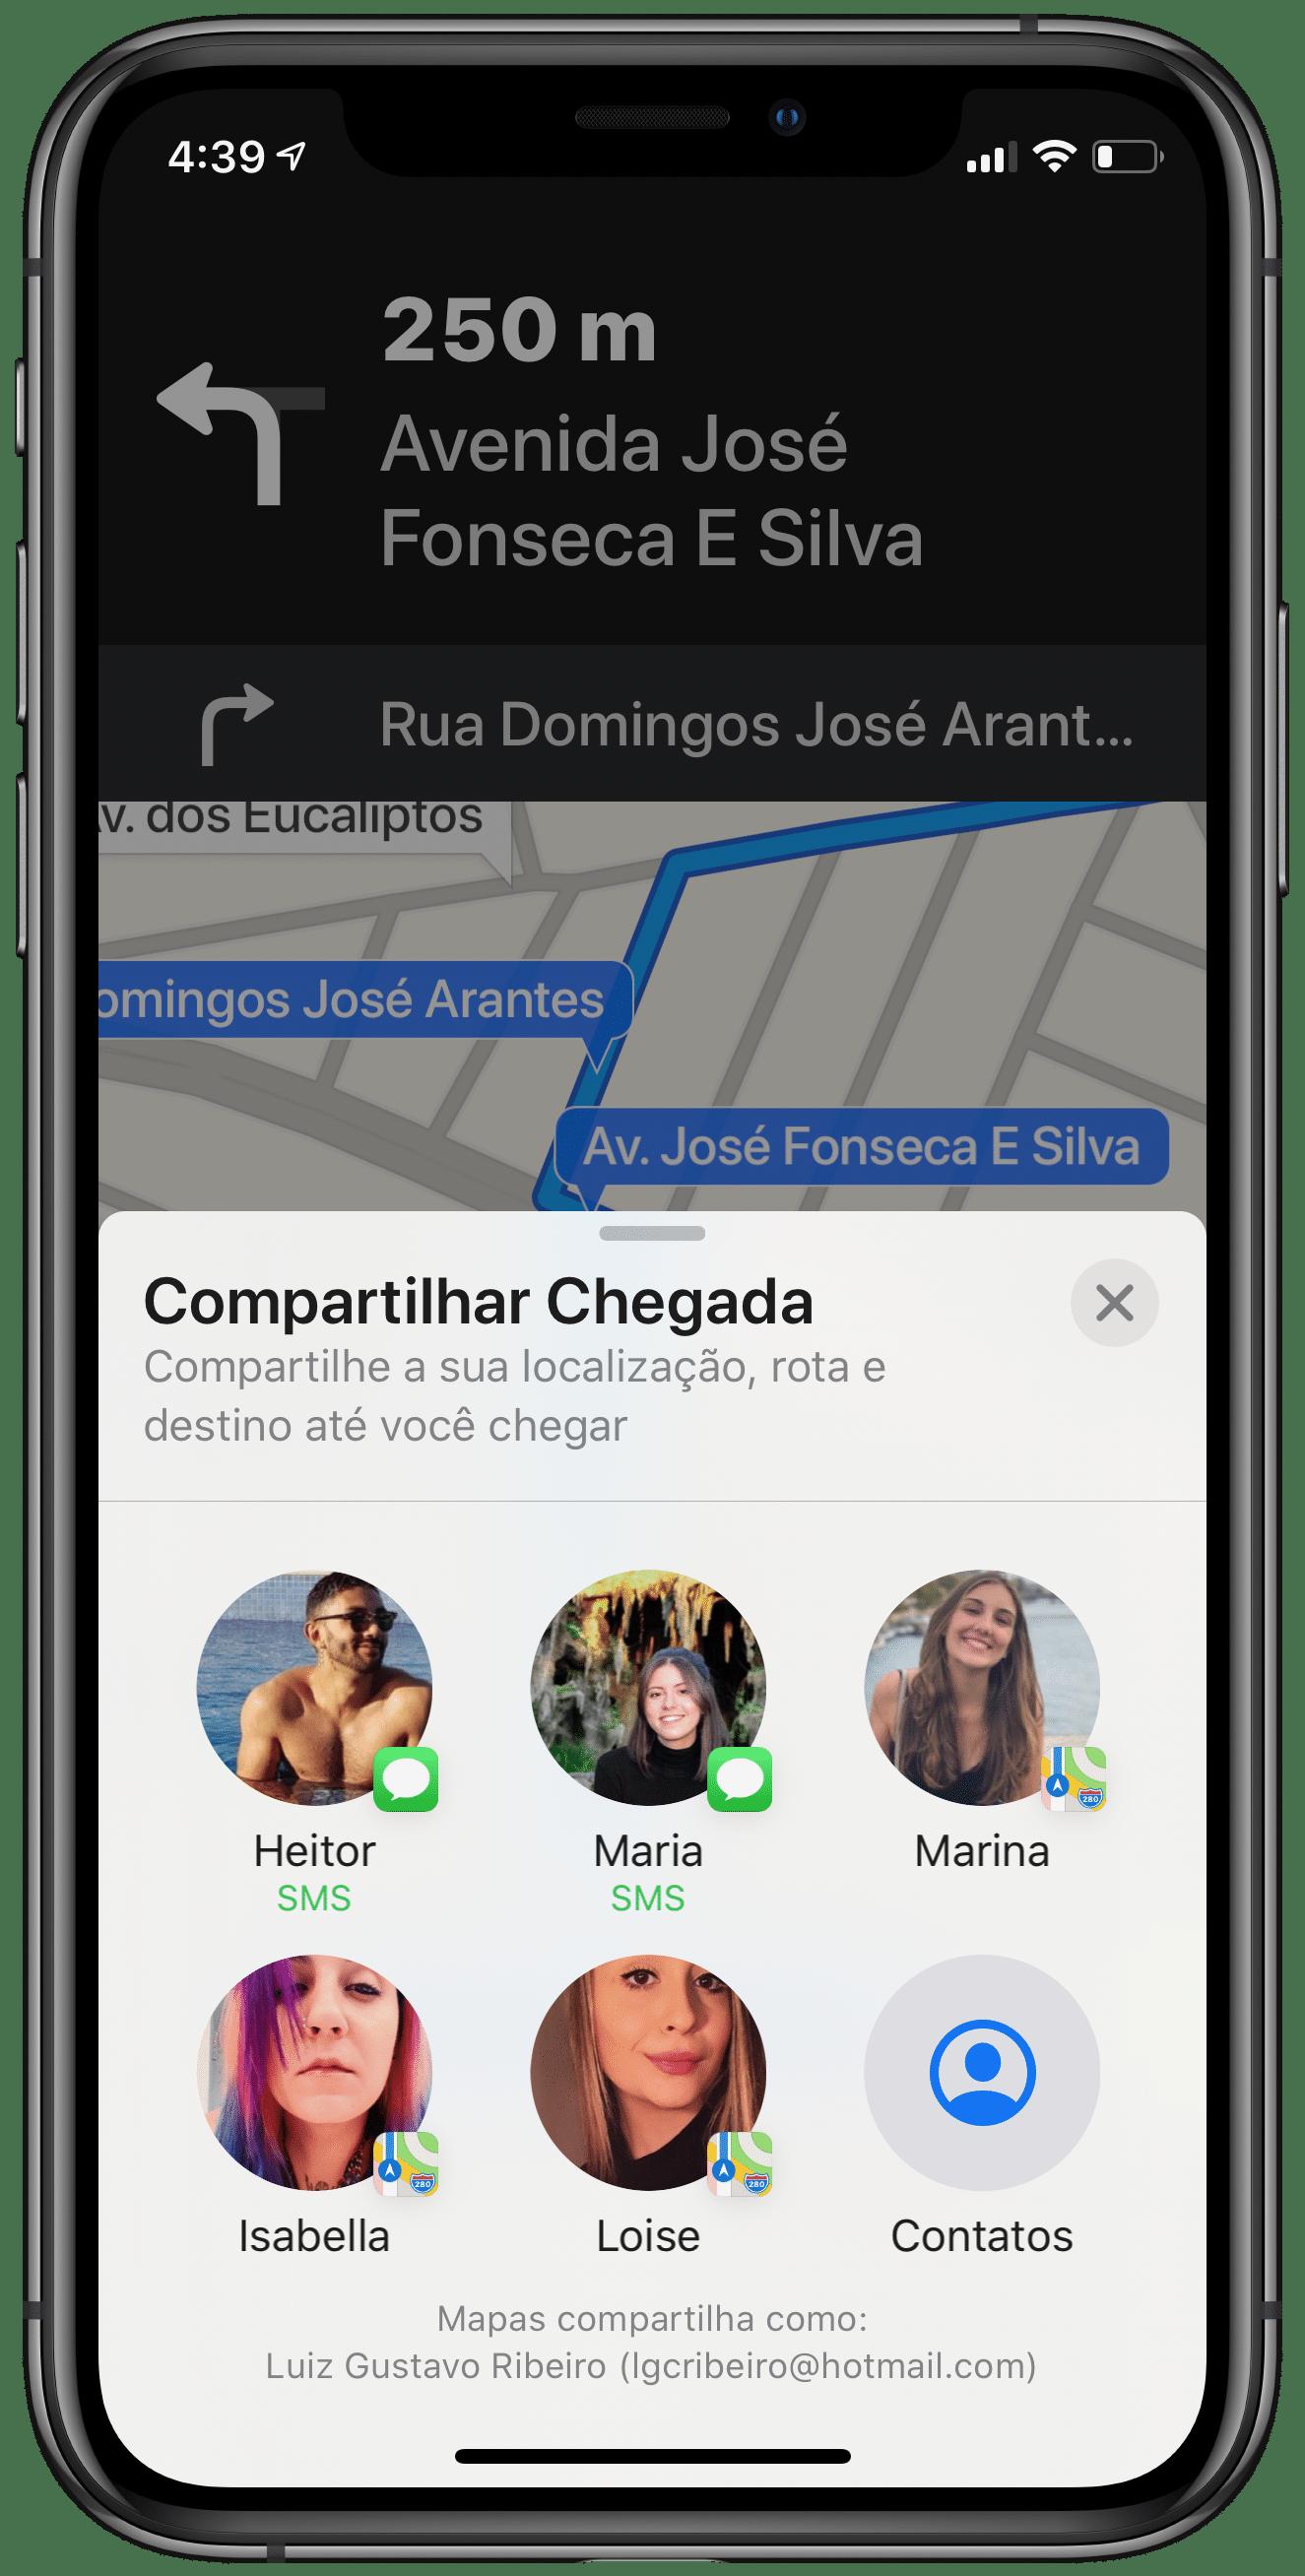 Compartilhar Chegada no Apple Maps